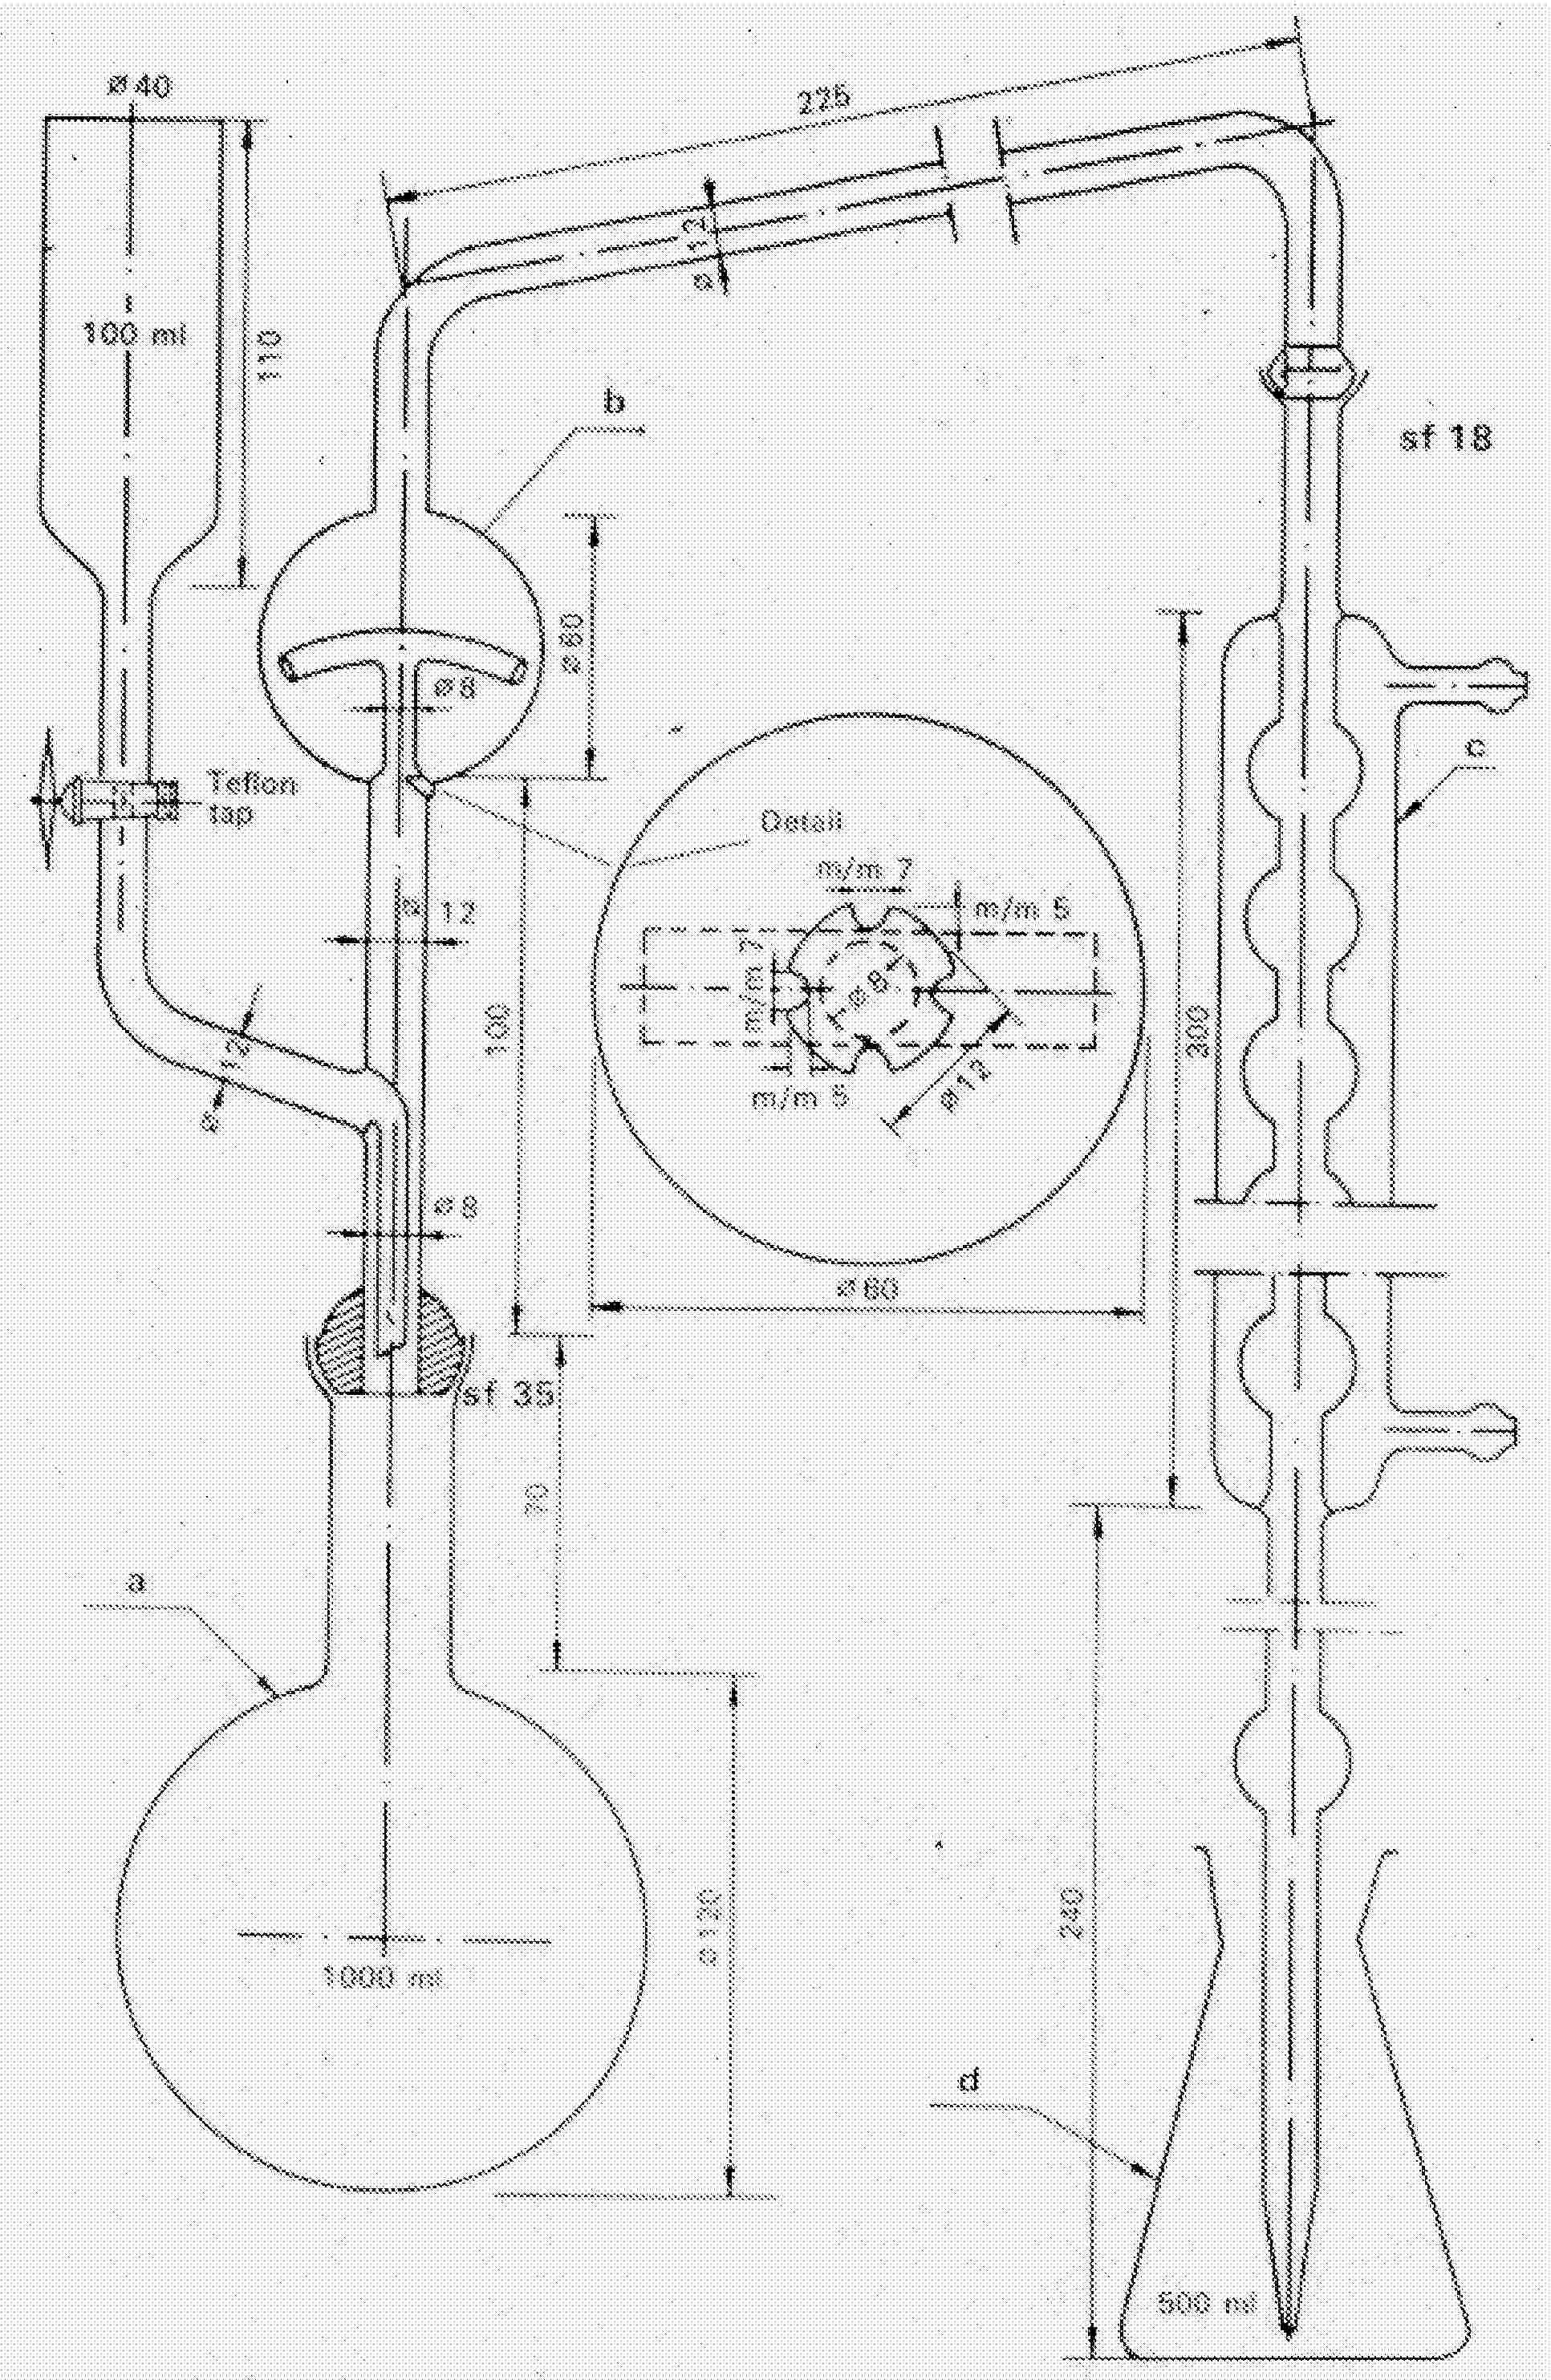 Eur Lex 02003r2003 20081128 Ga Wiring Diagrams For Lighting Circuits E2 80 93 Junction Box Method Figure 2